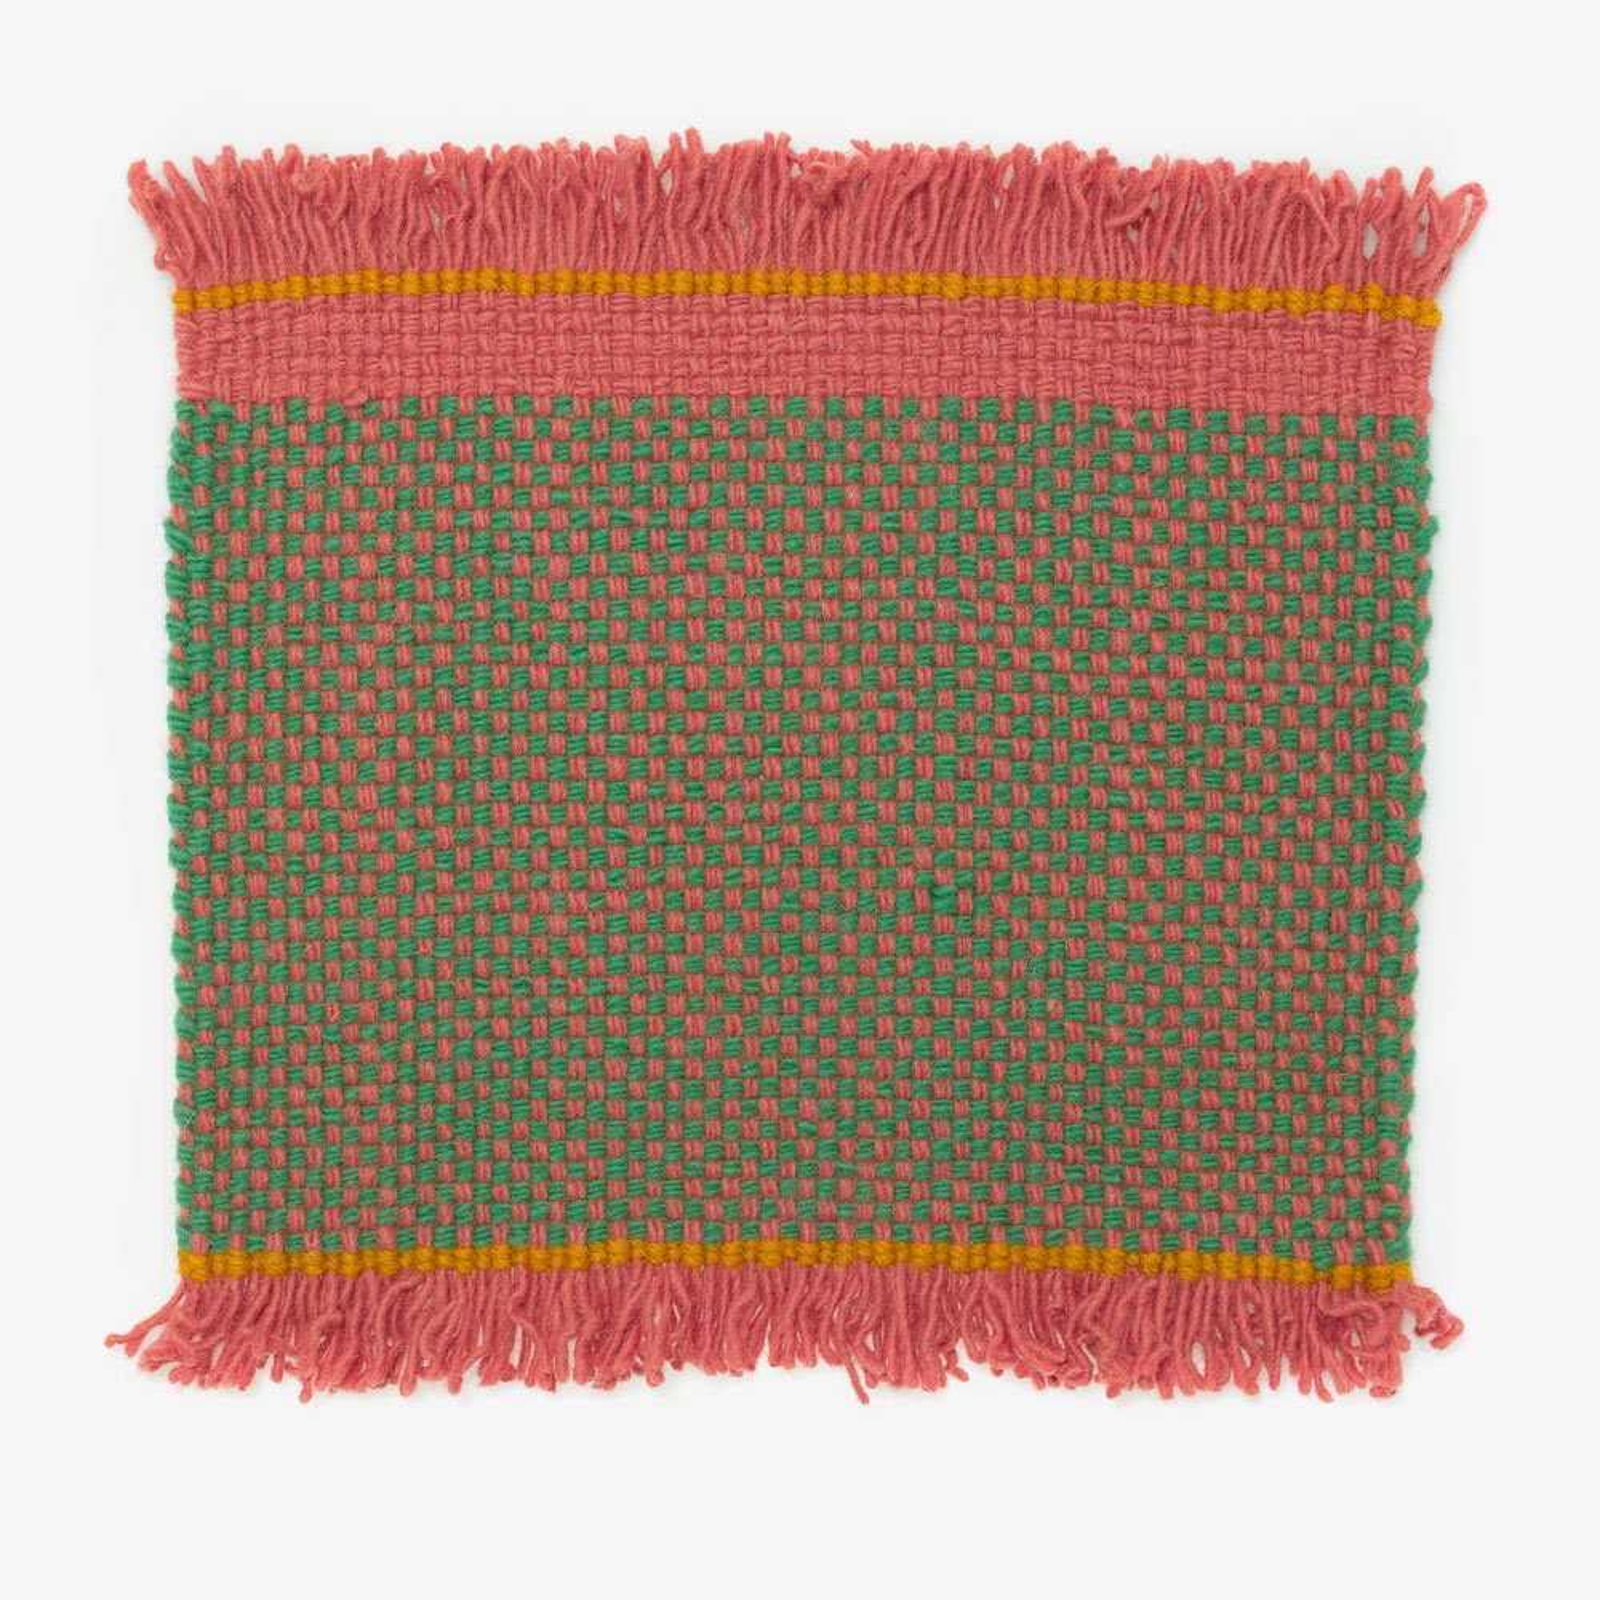 Kvadrat Rugs - Duotone - Farbe 0971 - Detailansicht